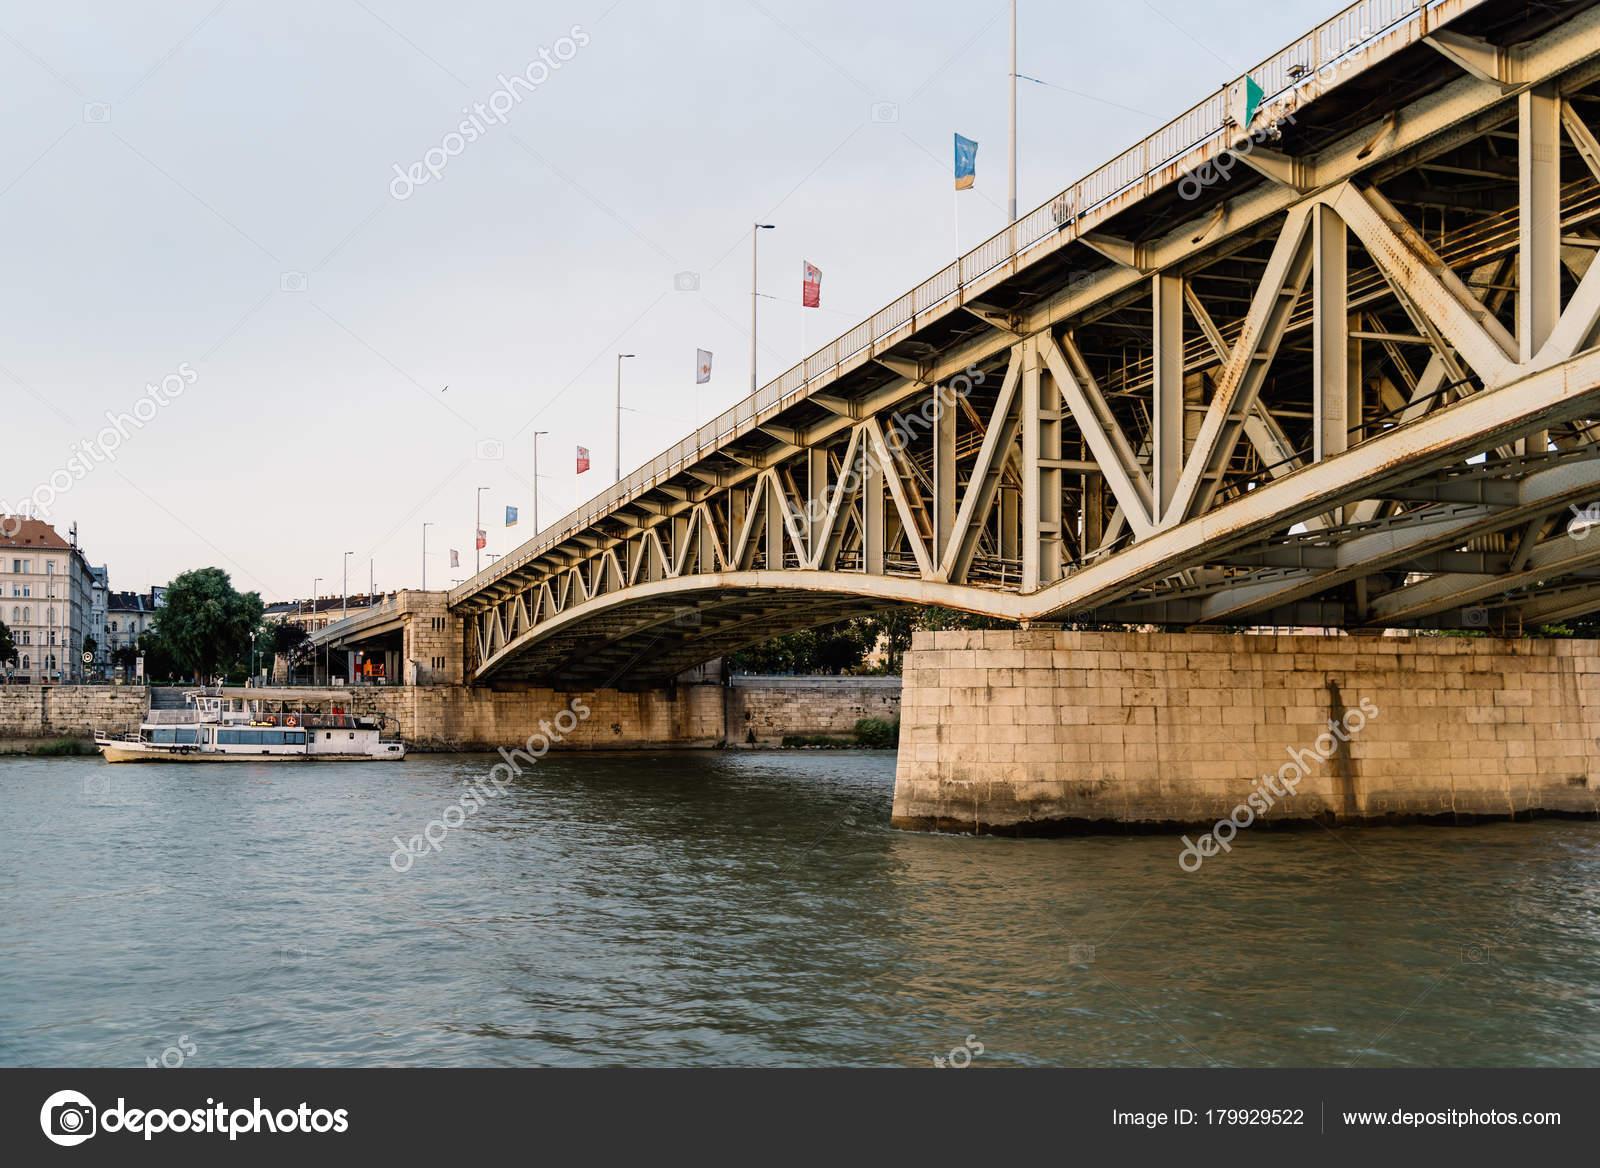 Gedicht Van Sándor Petőfi Brug Over De Rivier Donau In